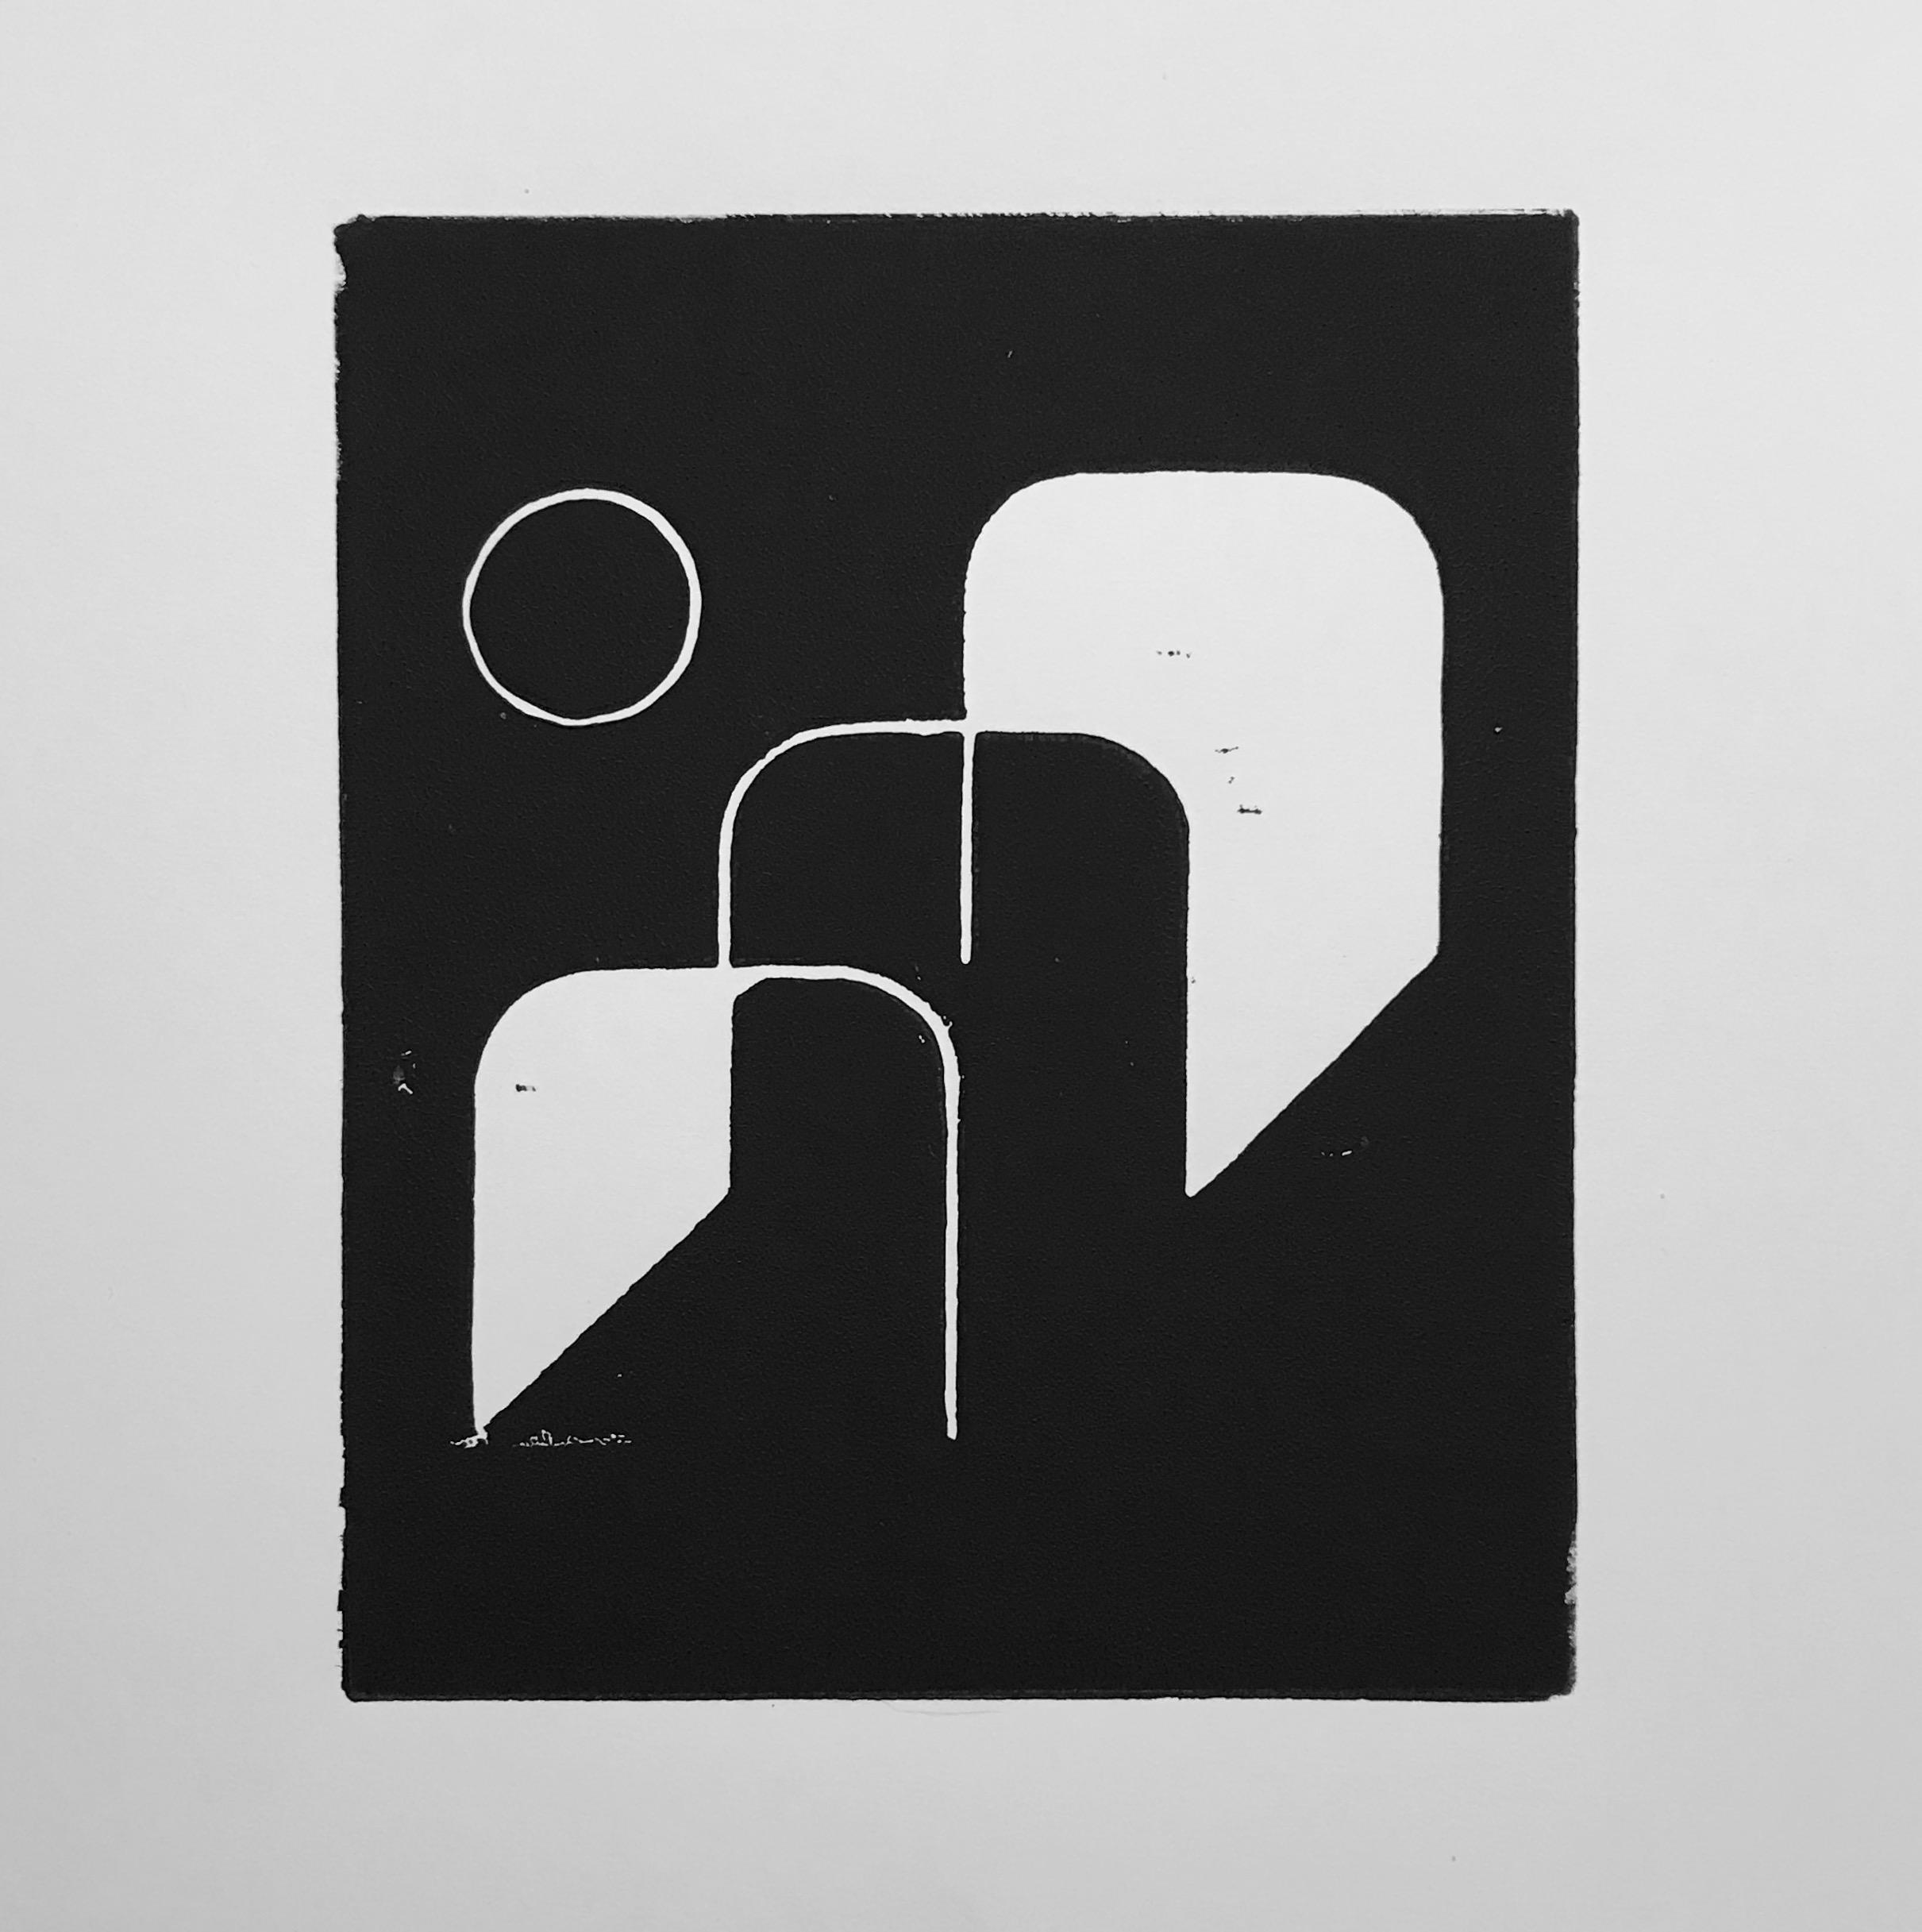 SKETCH/PRINT I